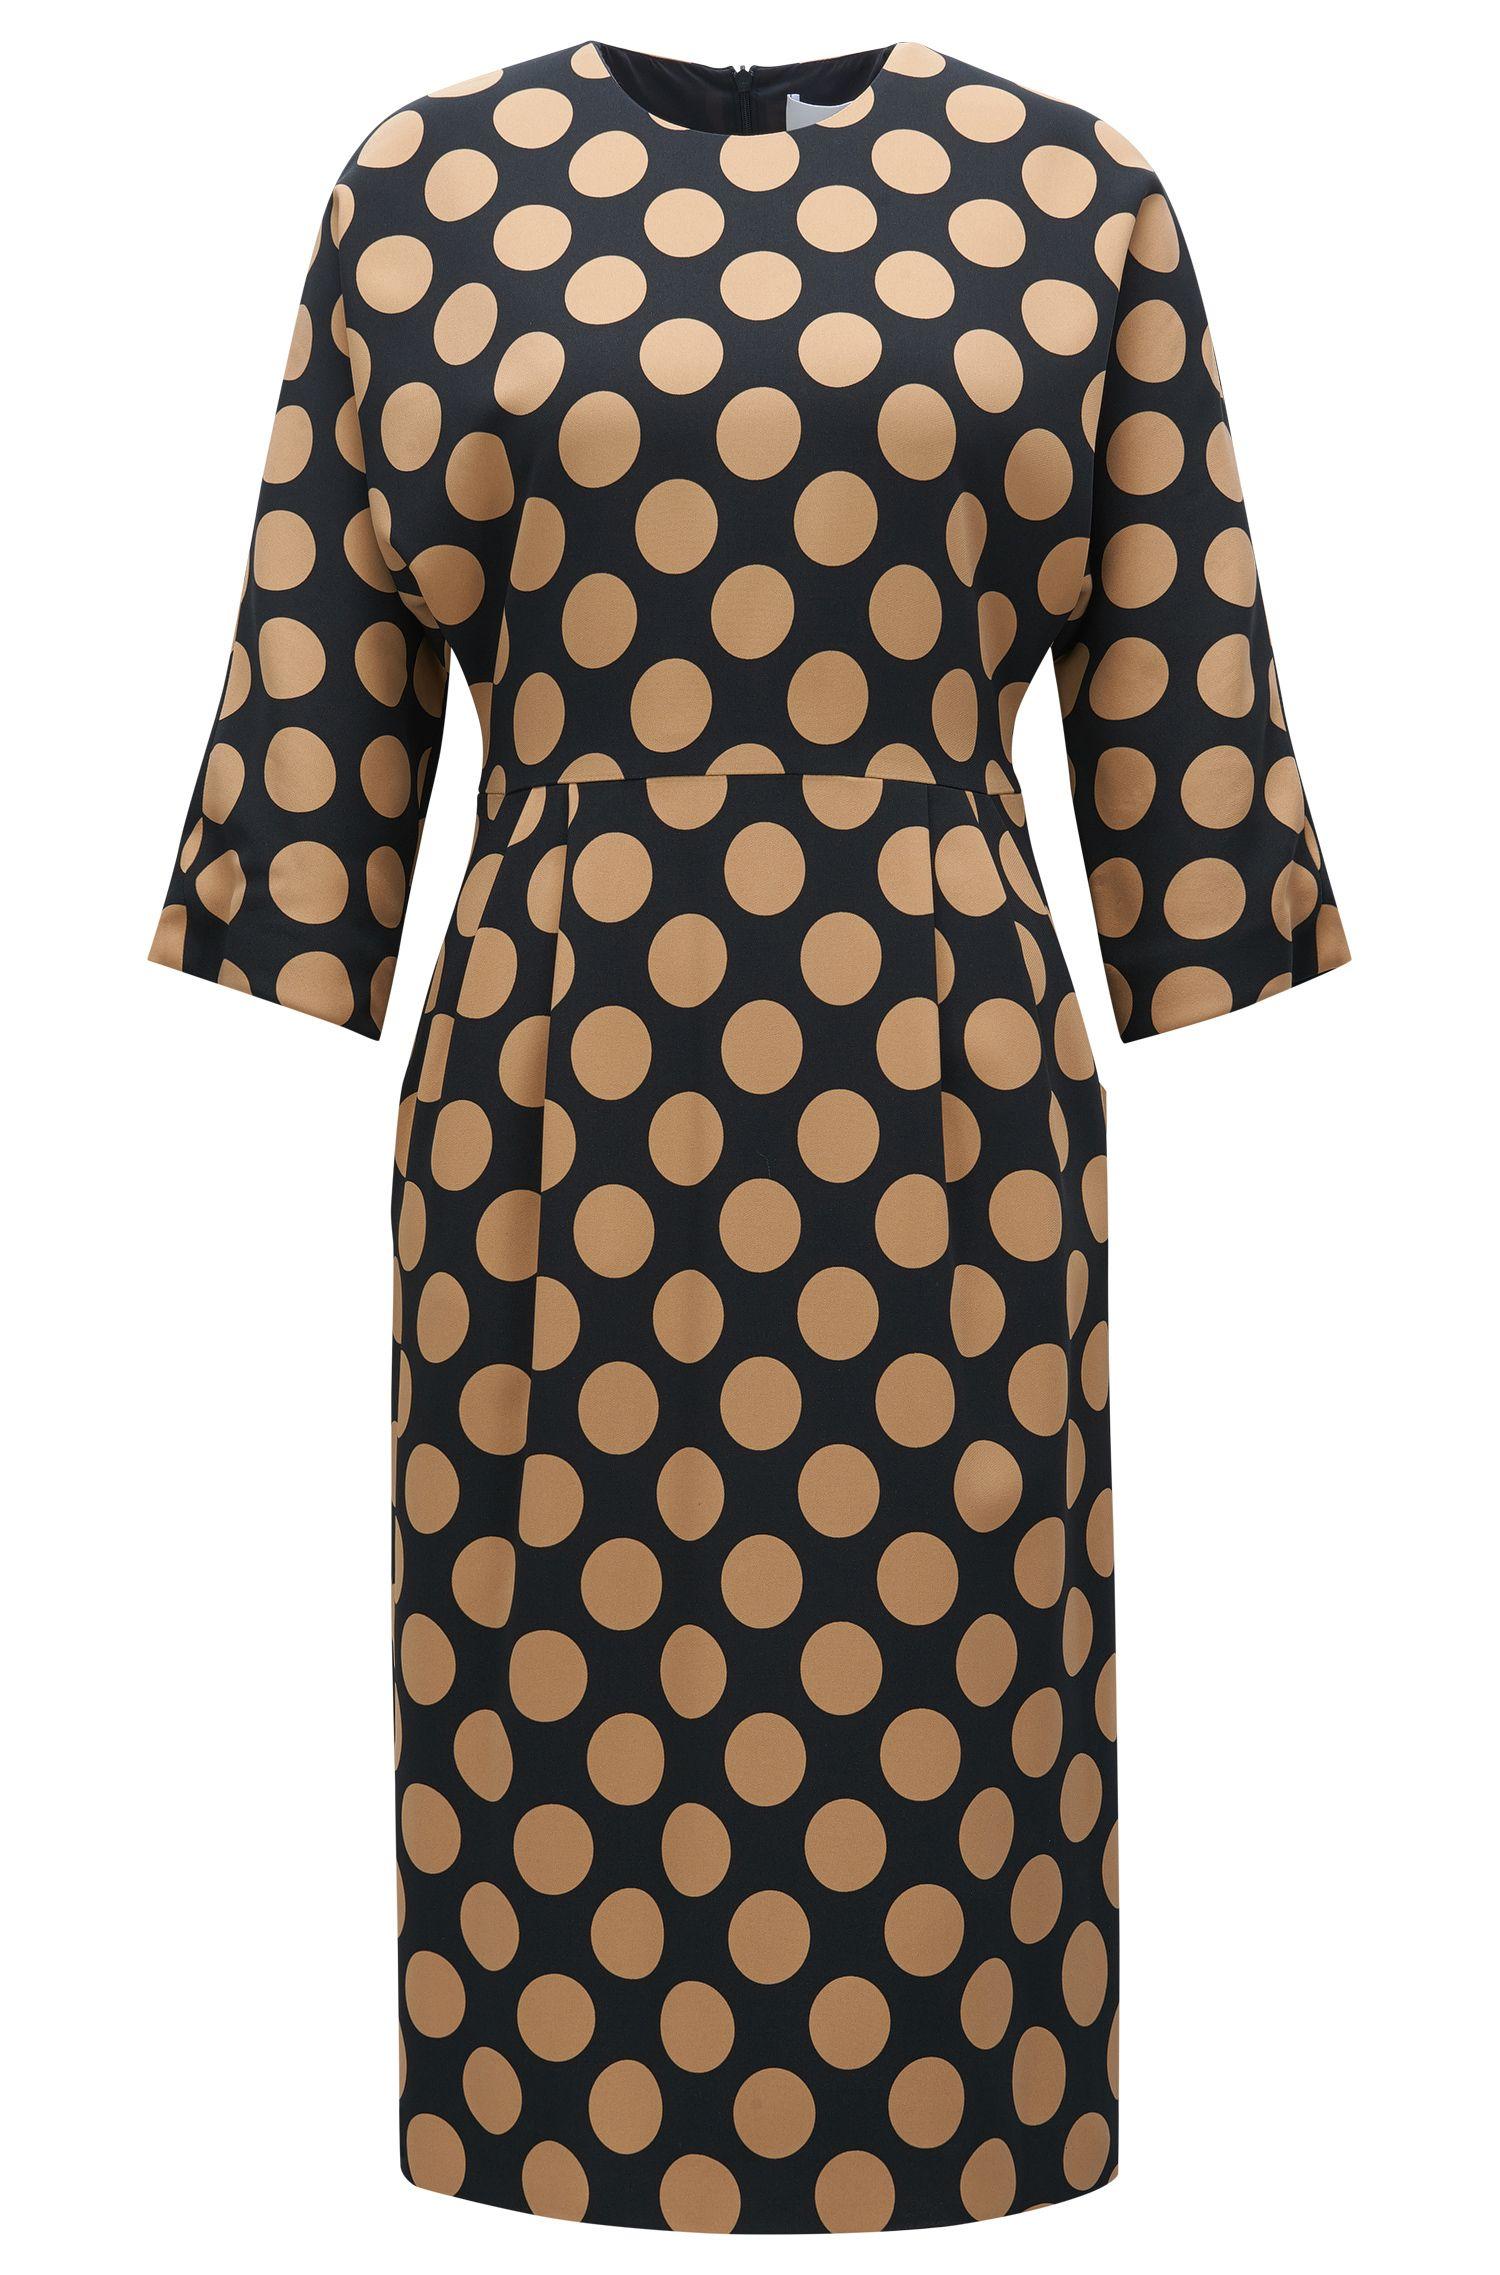 Polka-dot dress in stretch fabric